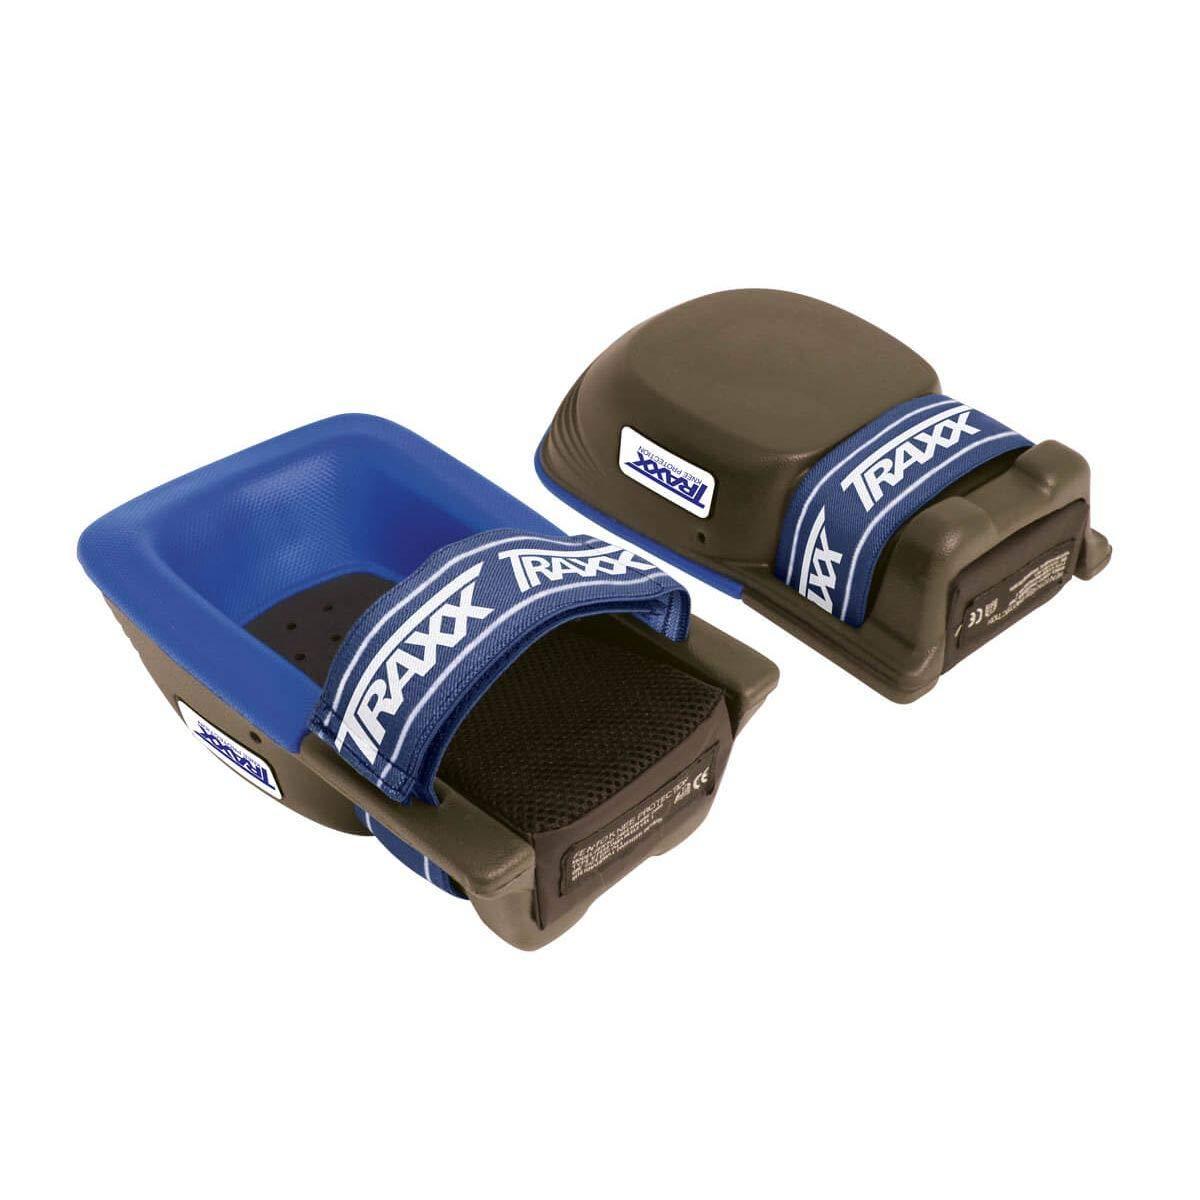 TRAXX 200 PRO Knee Pads by Traxx